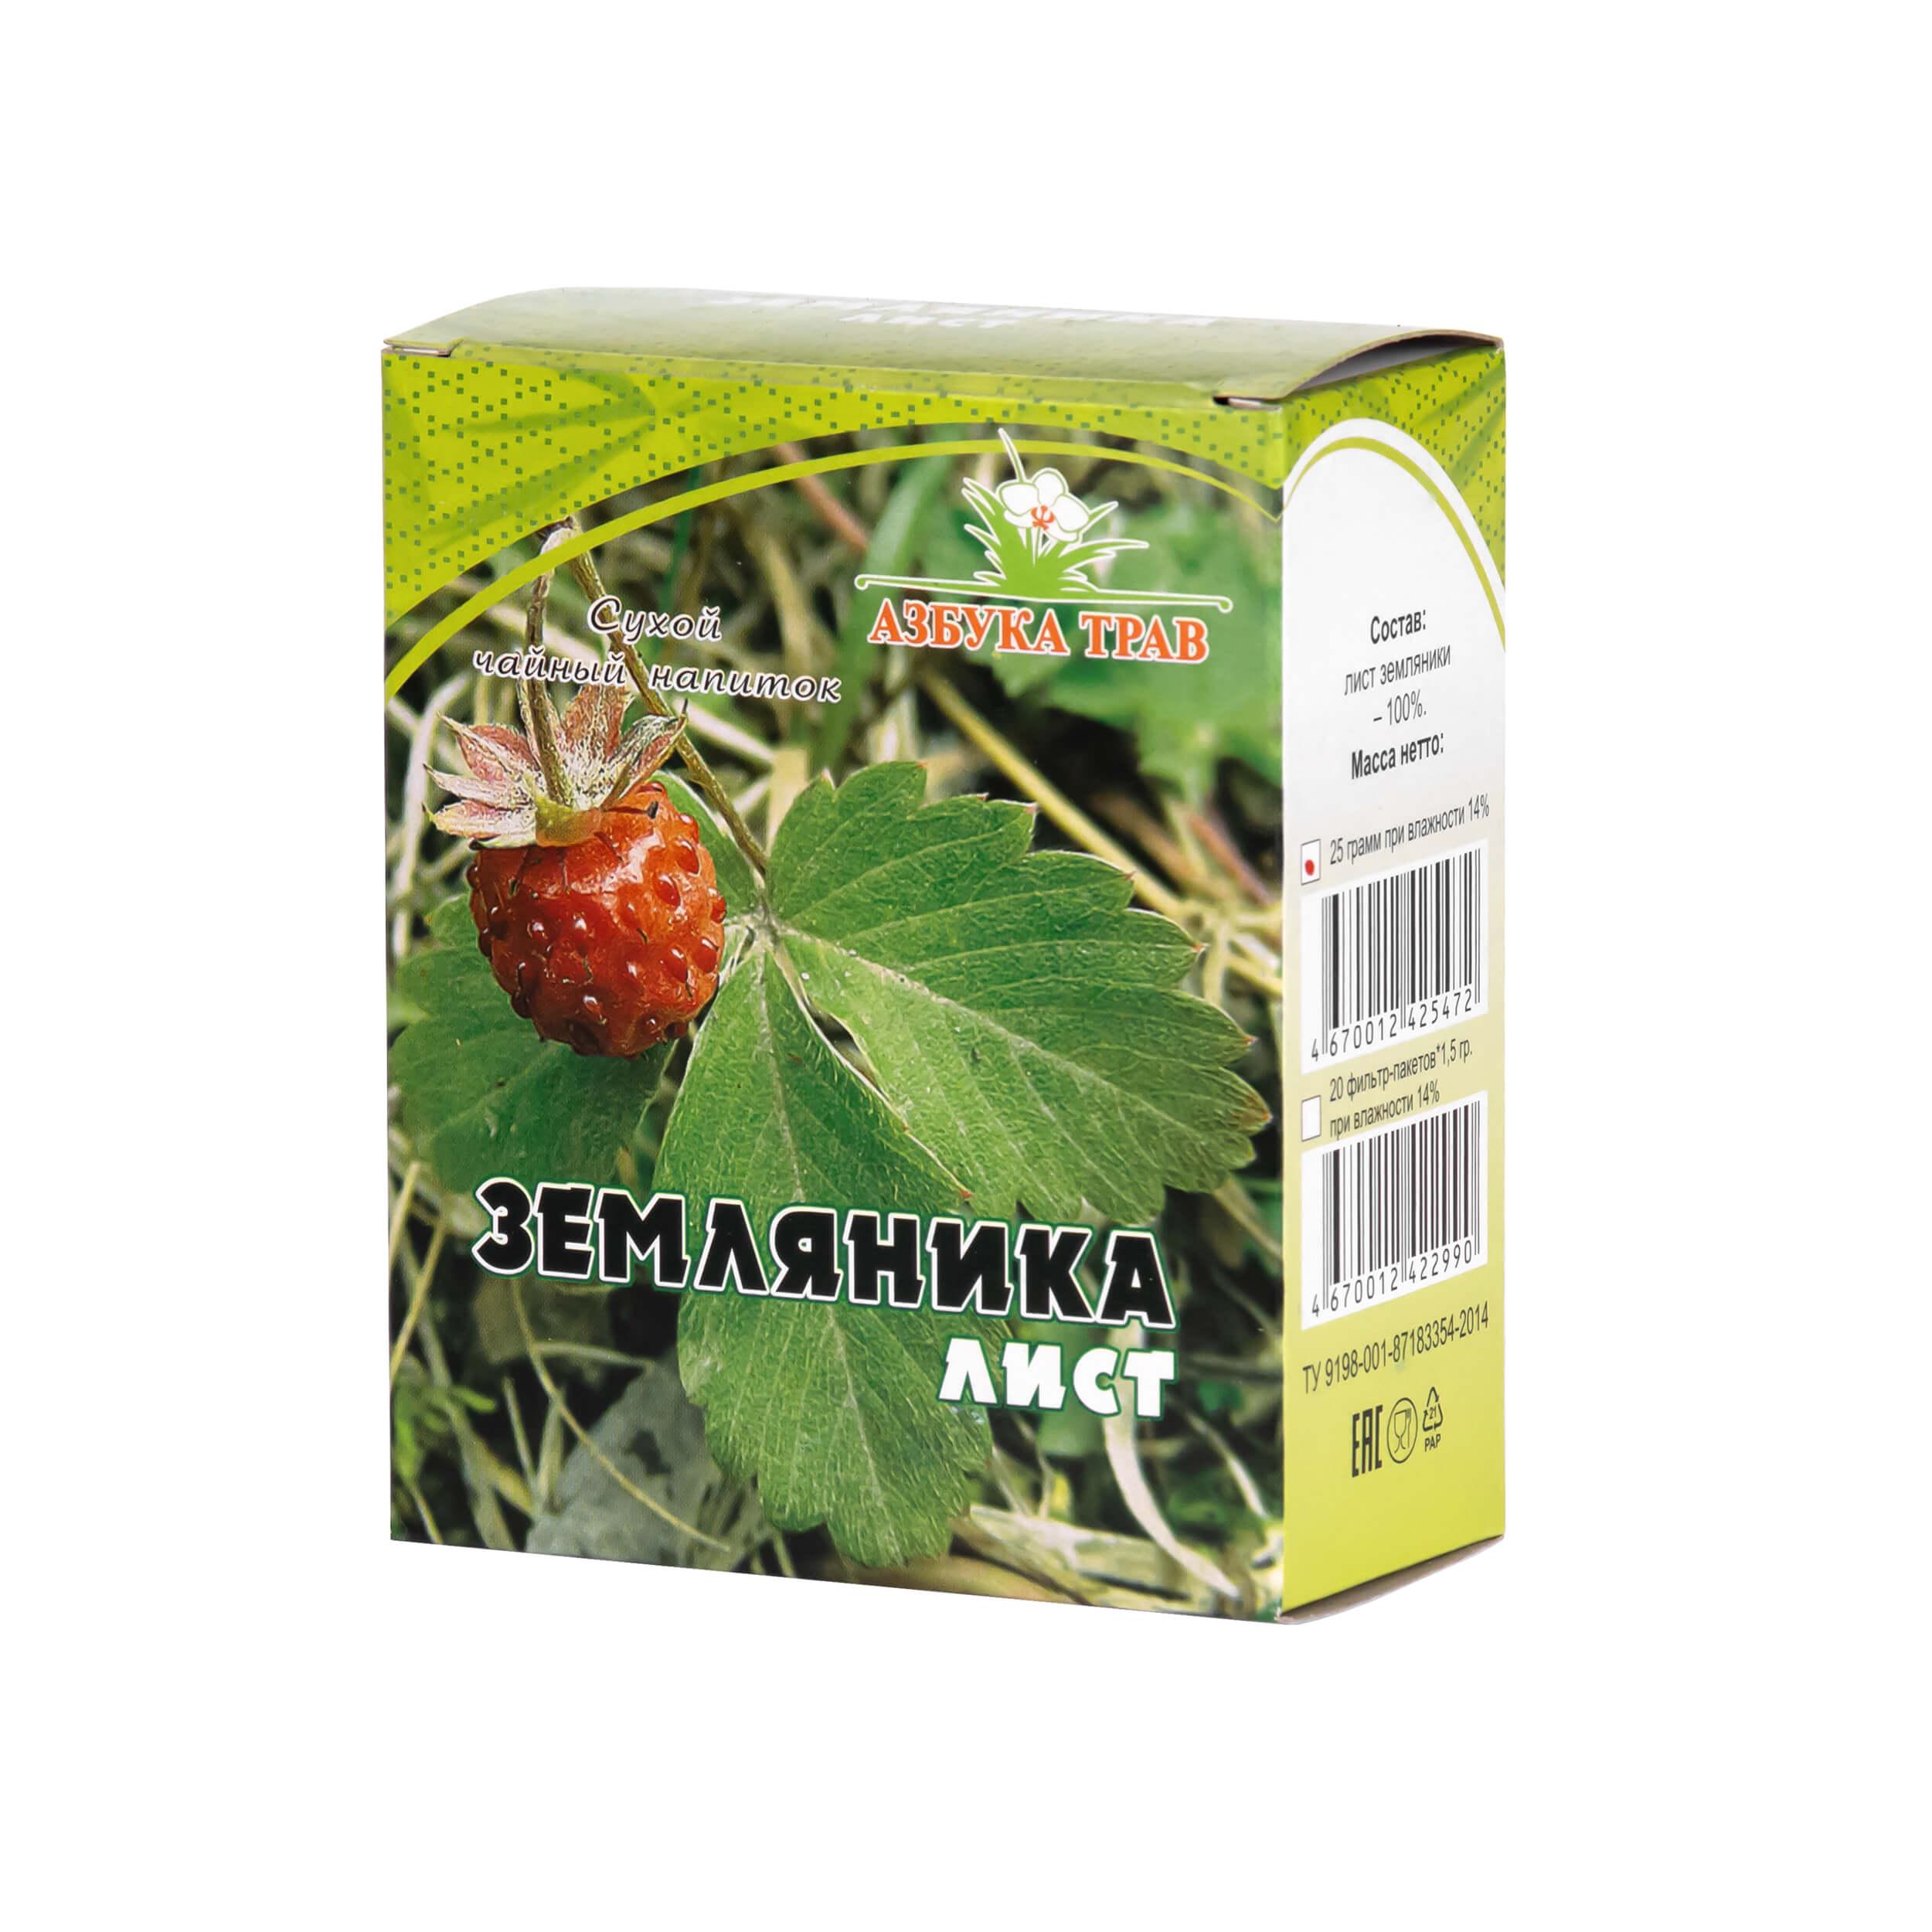 Земляника (листья, 25 грамм) фото